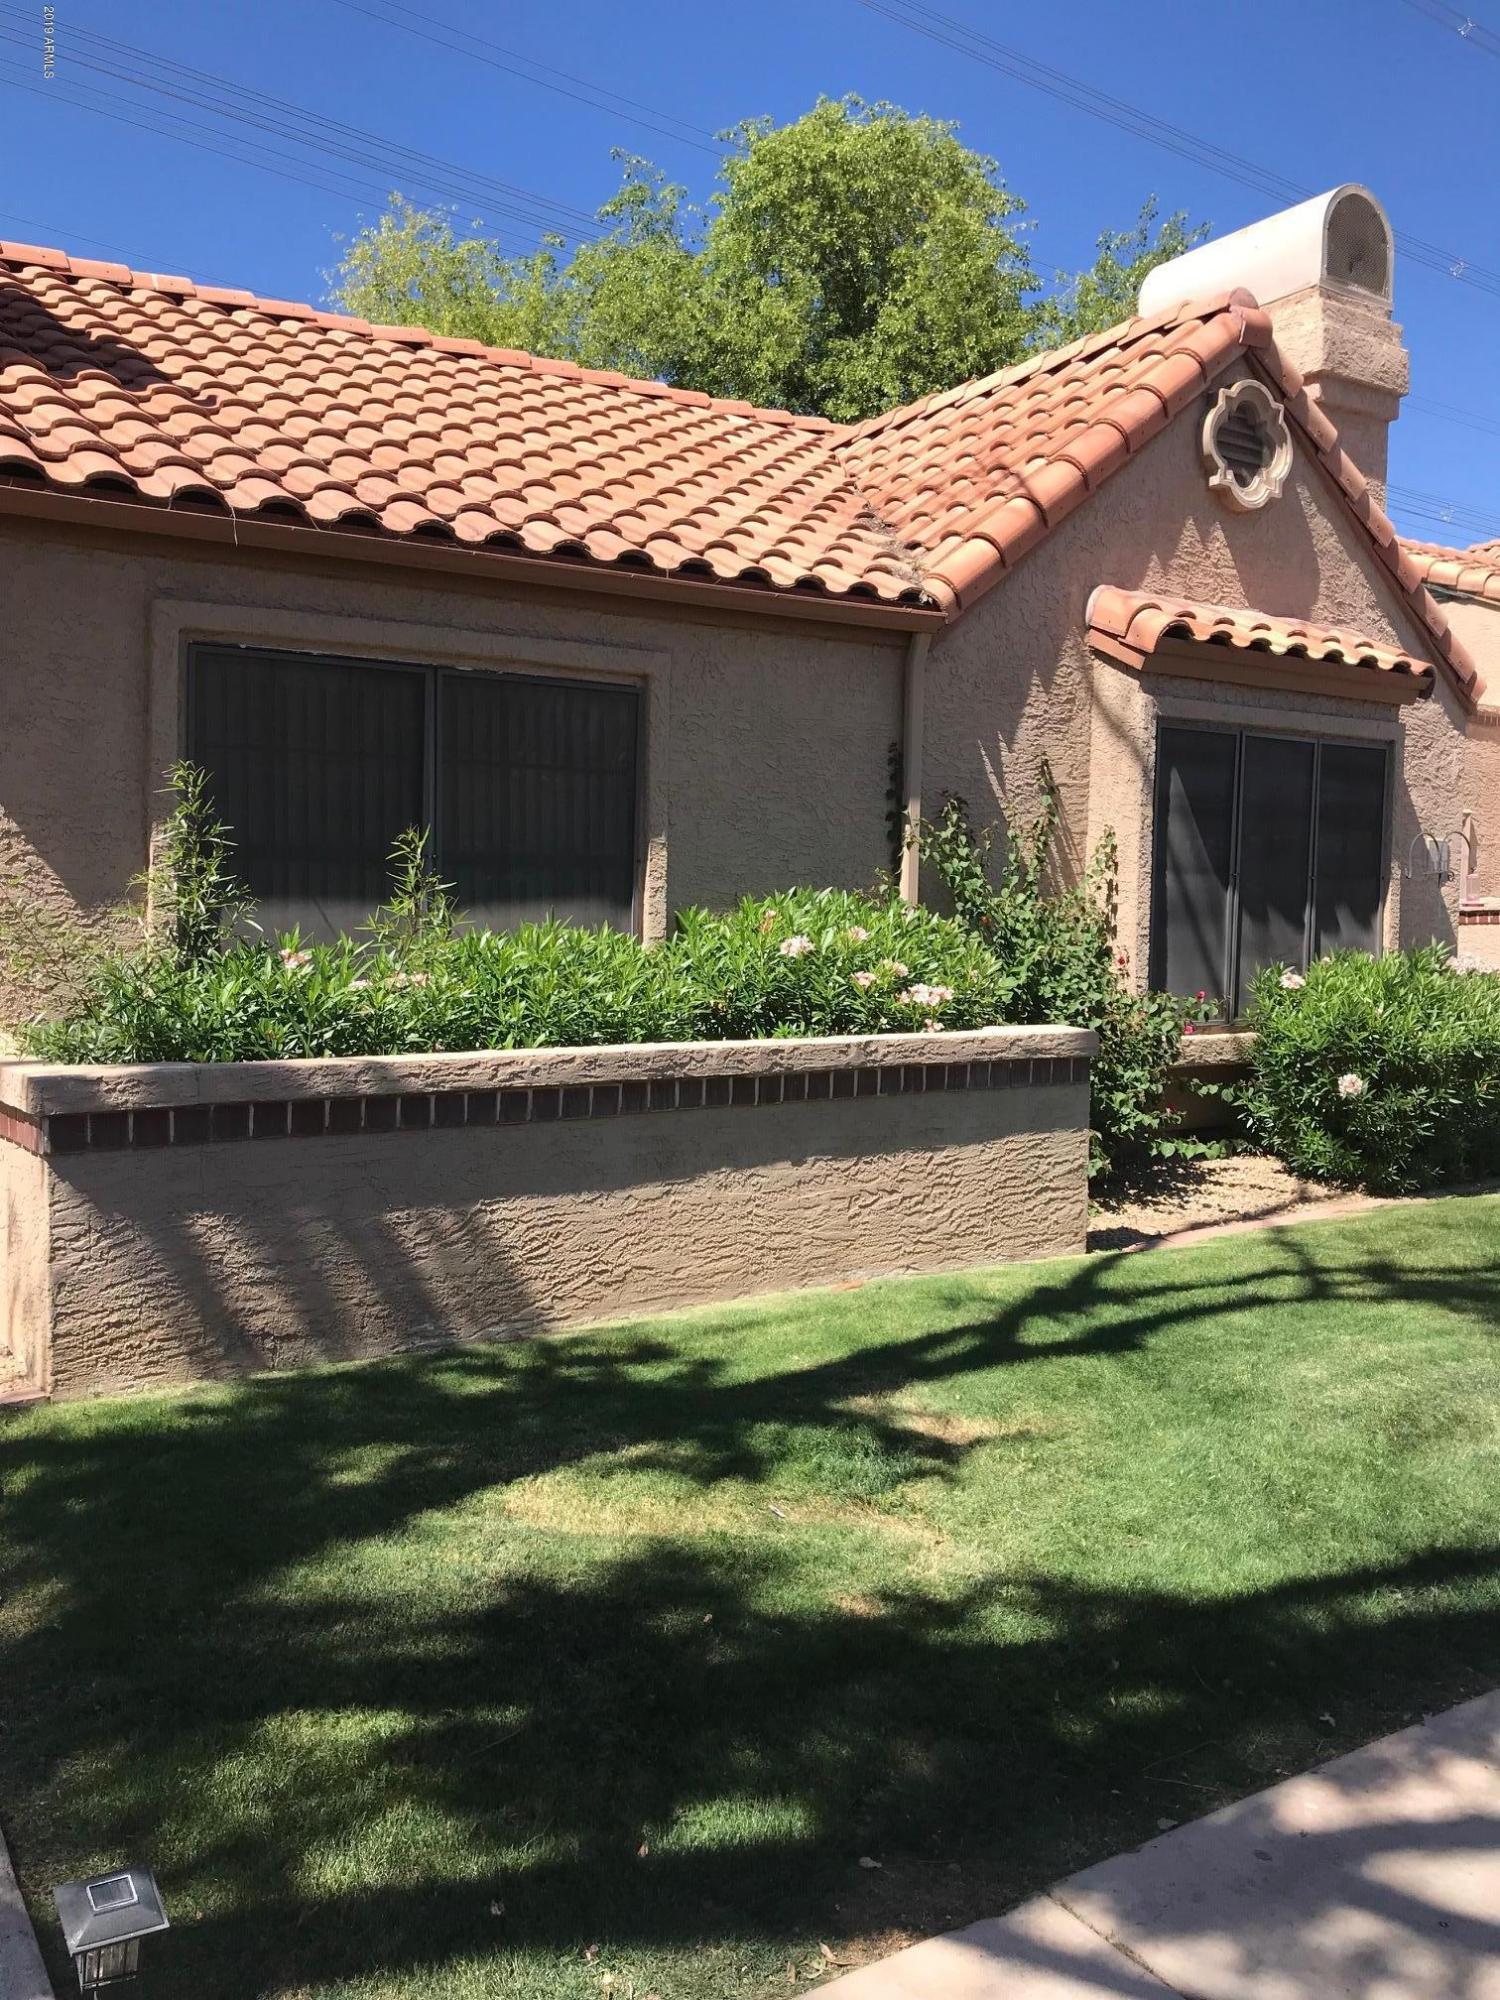 Photo of 3491 N Arizona #163 Avenue, Chandler, AZ 85225